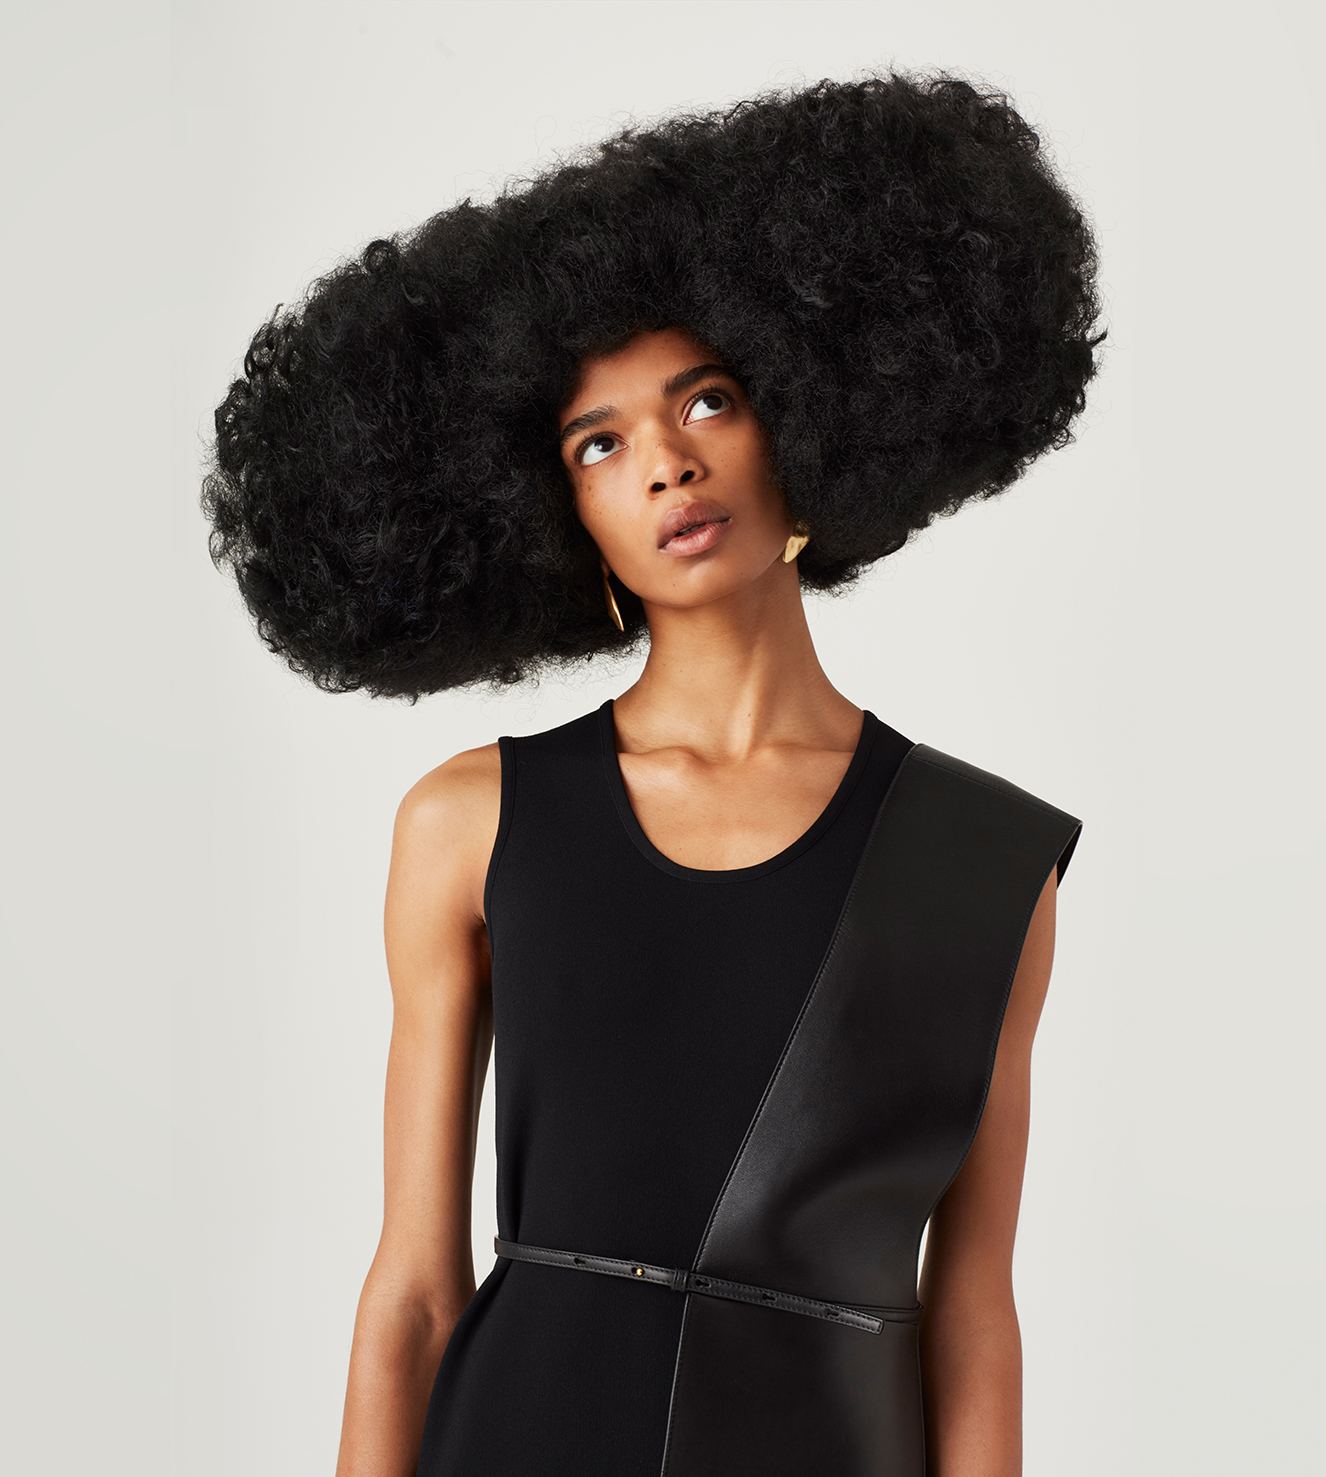 Jill Sander's viscose knit dress and leather belt.